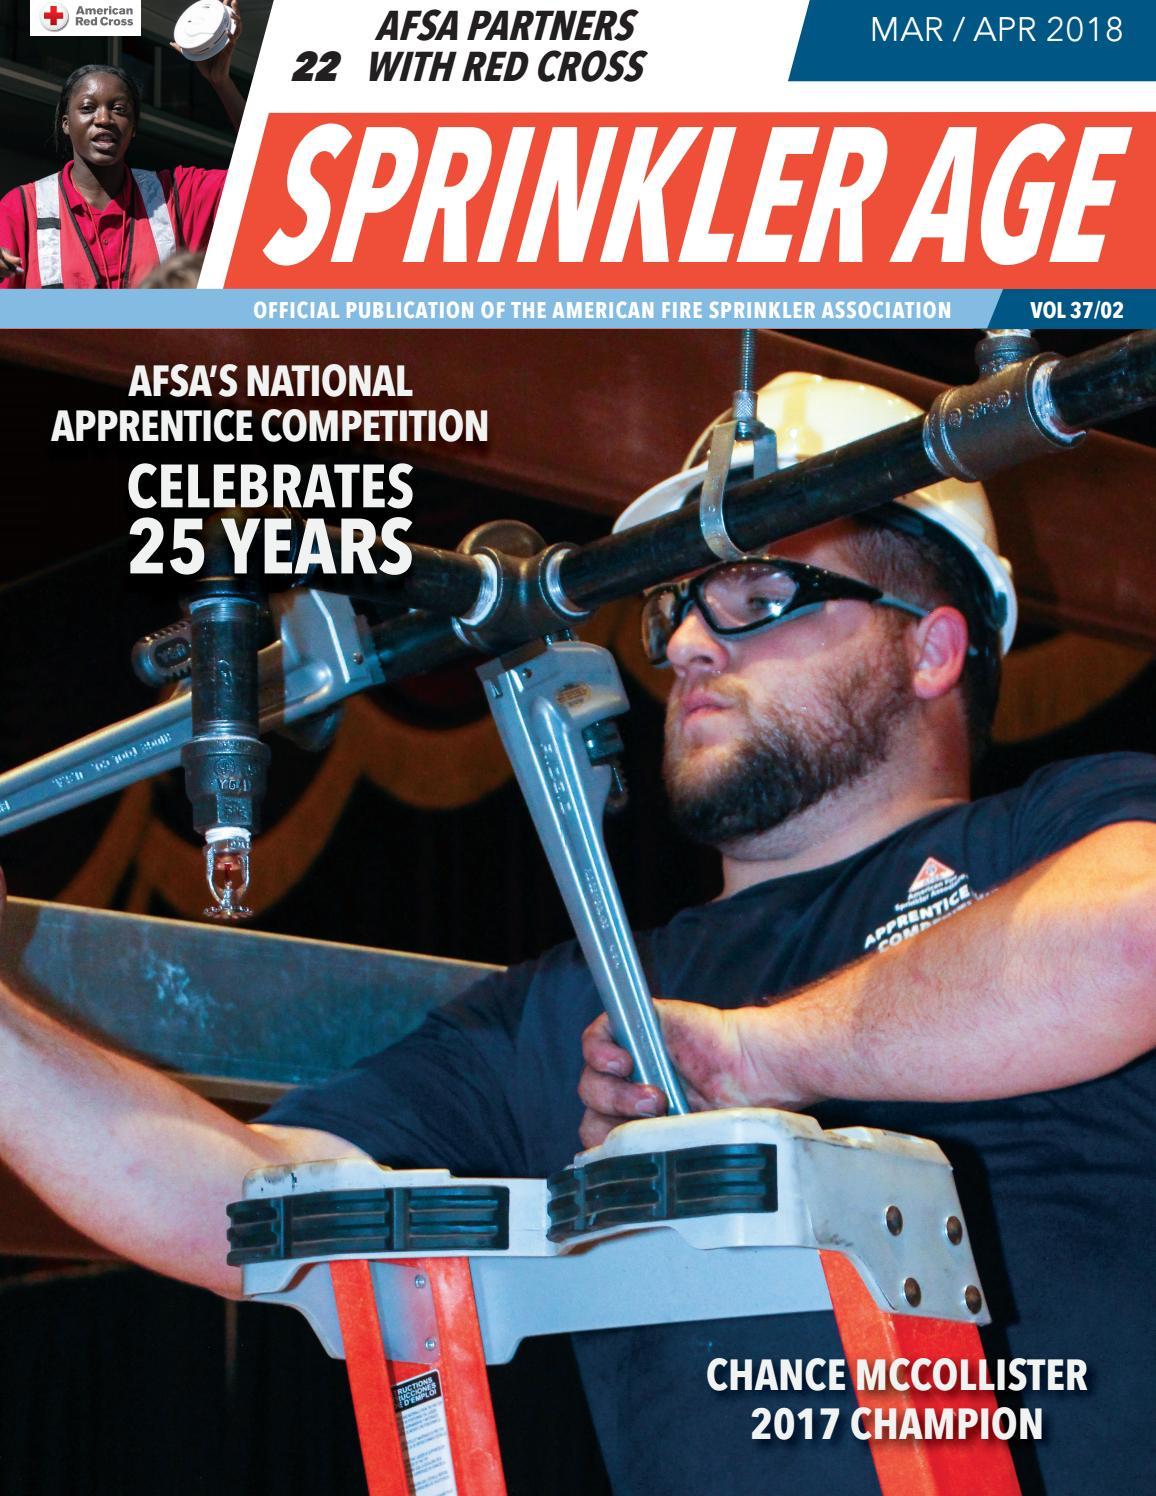 March/April 2018 Sprinkler Age by SprinklerAge - issuu